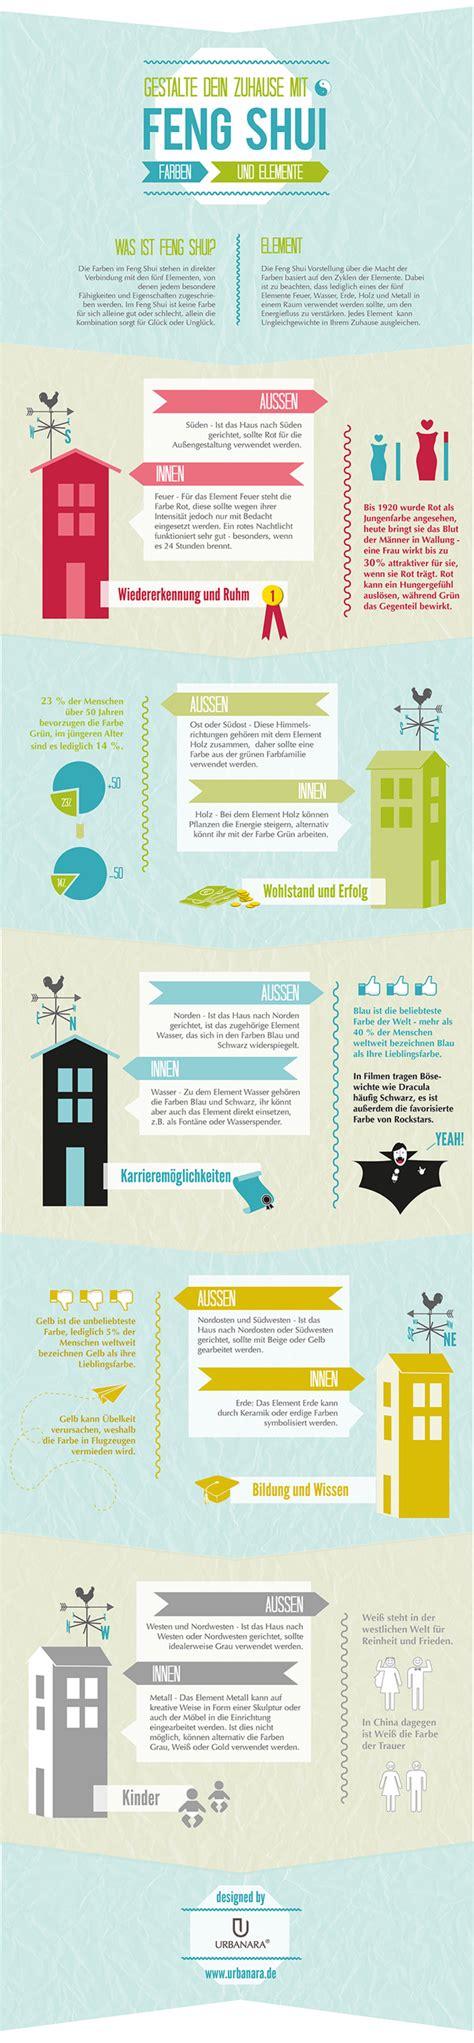 feng shui farben feng shui farben die infografik